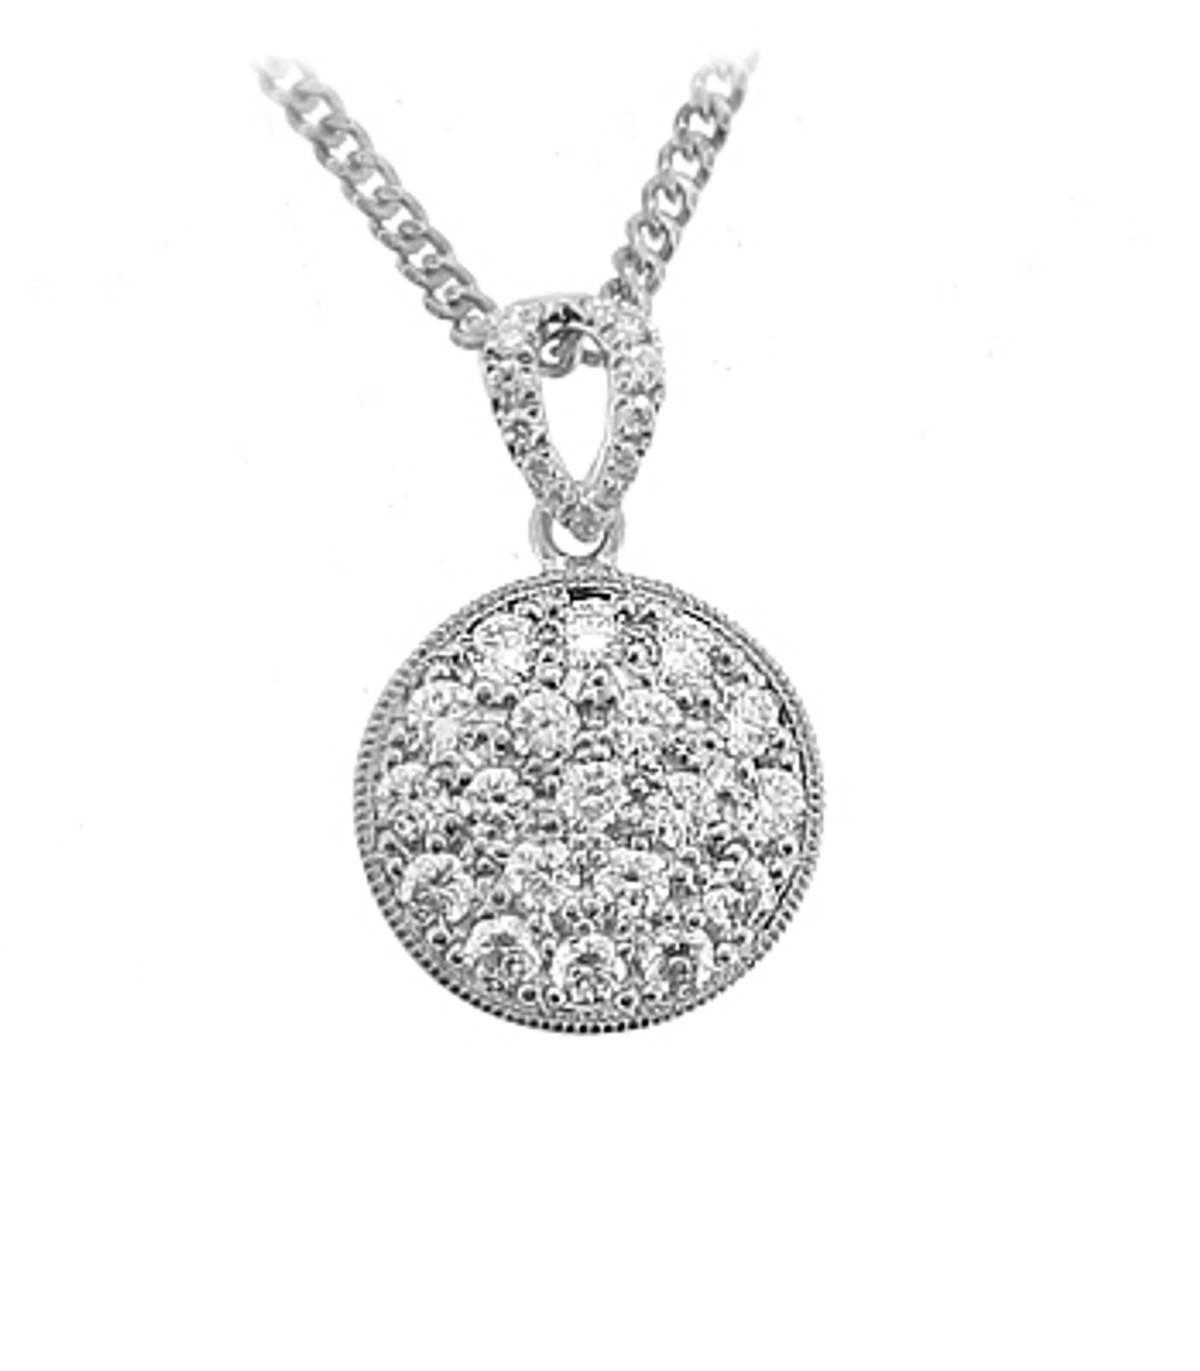 "18k White Gold Brilliant Cut Diamond Cluster Pendant On 18k White Gold 18"" Chain Total Diamond Weight 0.45cts Pendant length 1.6cmPendant width 1.1cm"